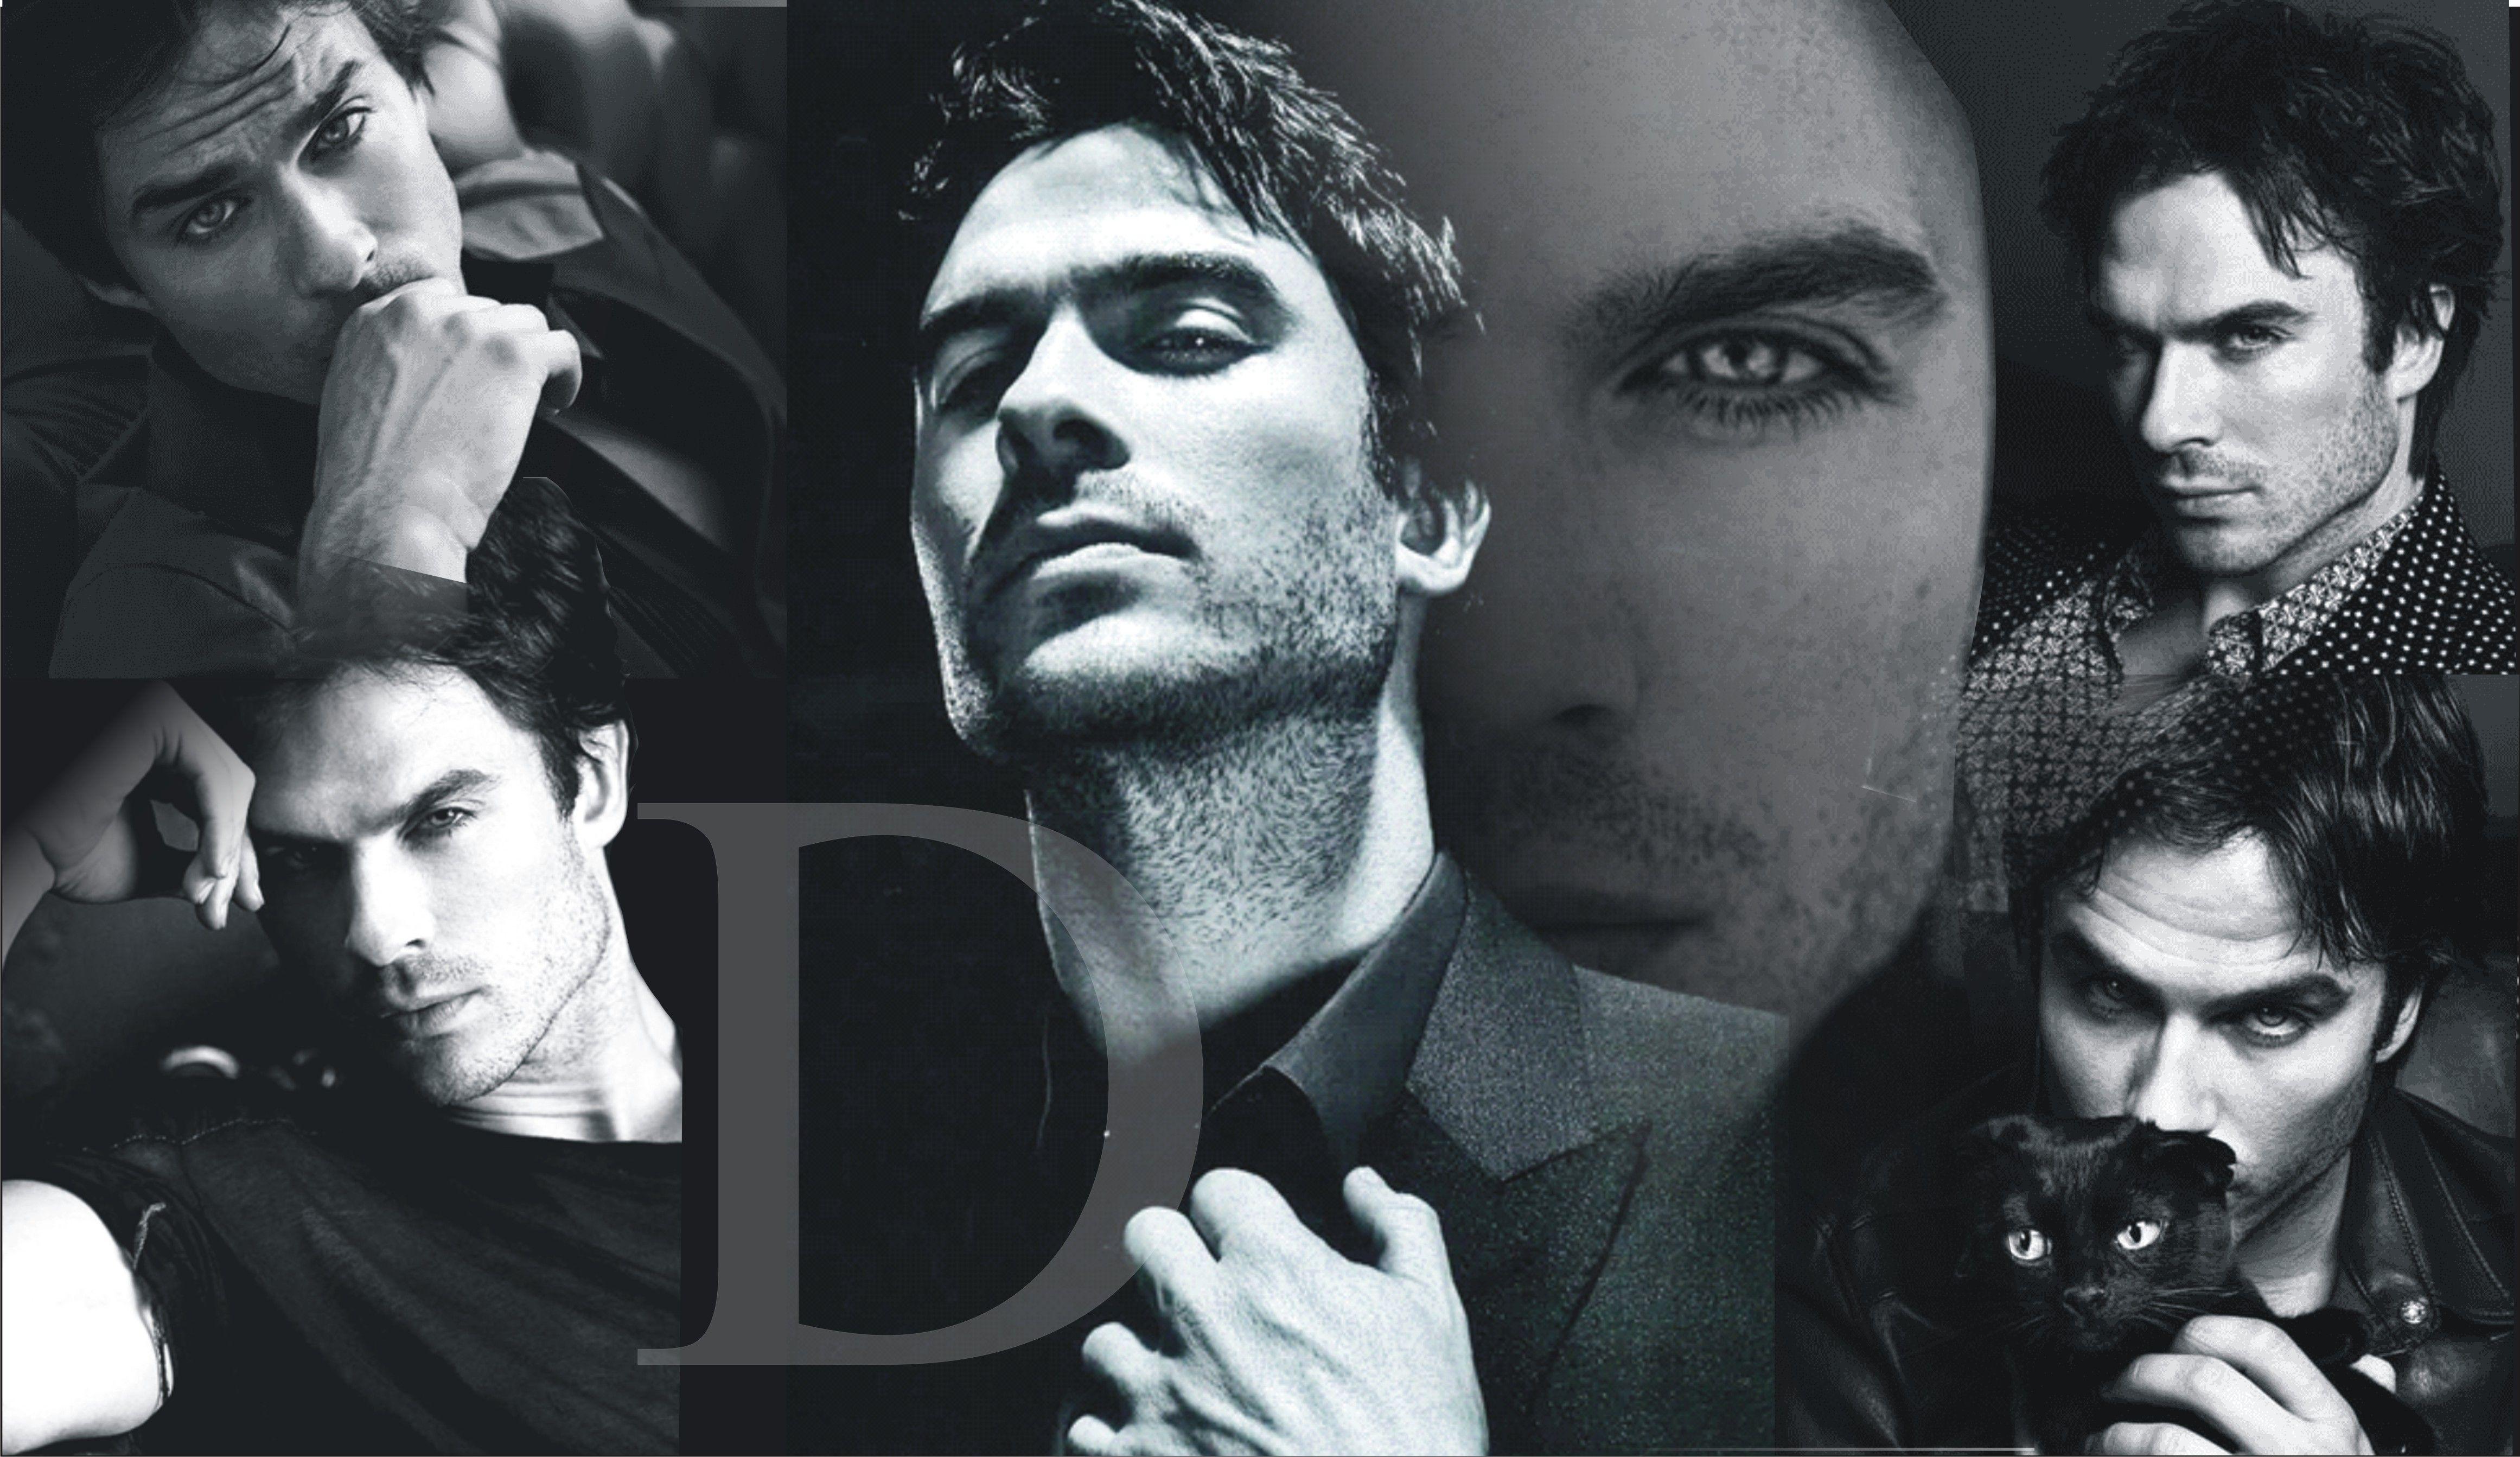 Desktop Wallpapers I designed :) Enjoy ladies | Damon ...